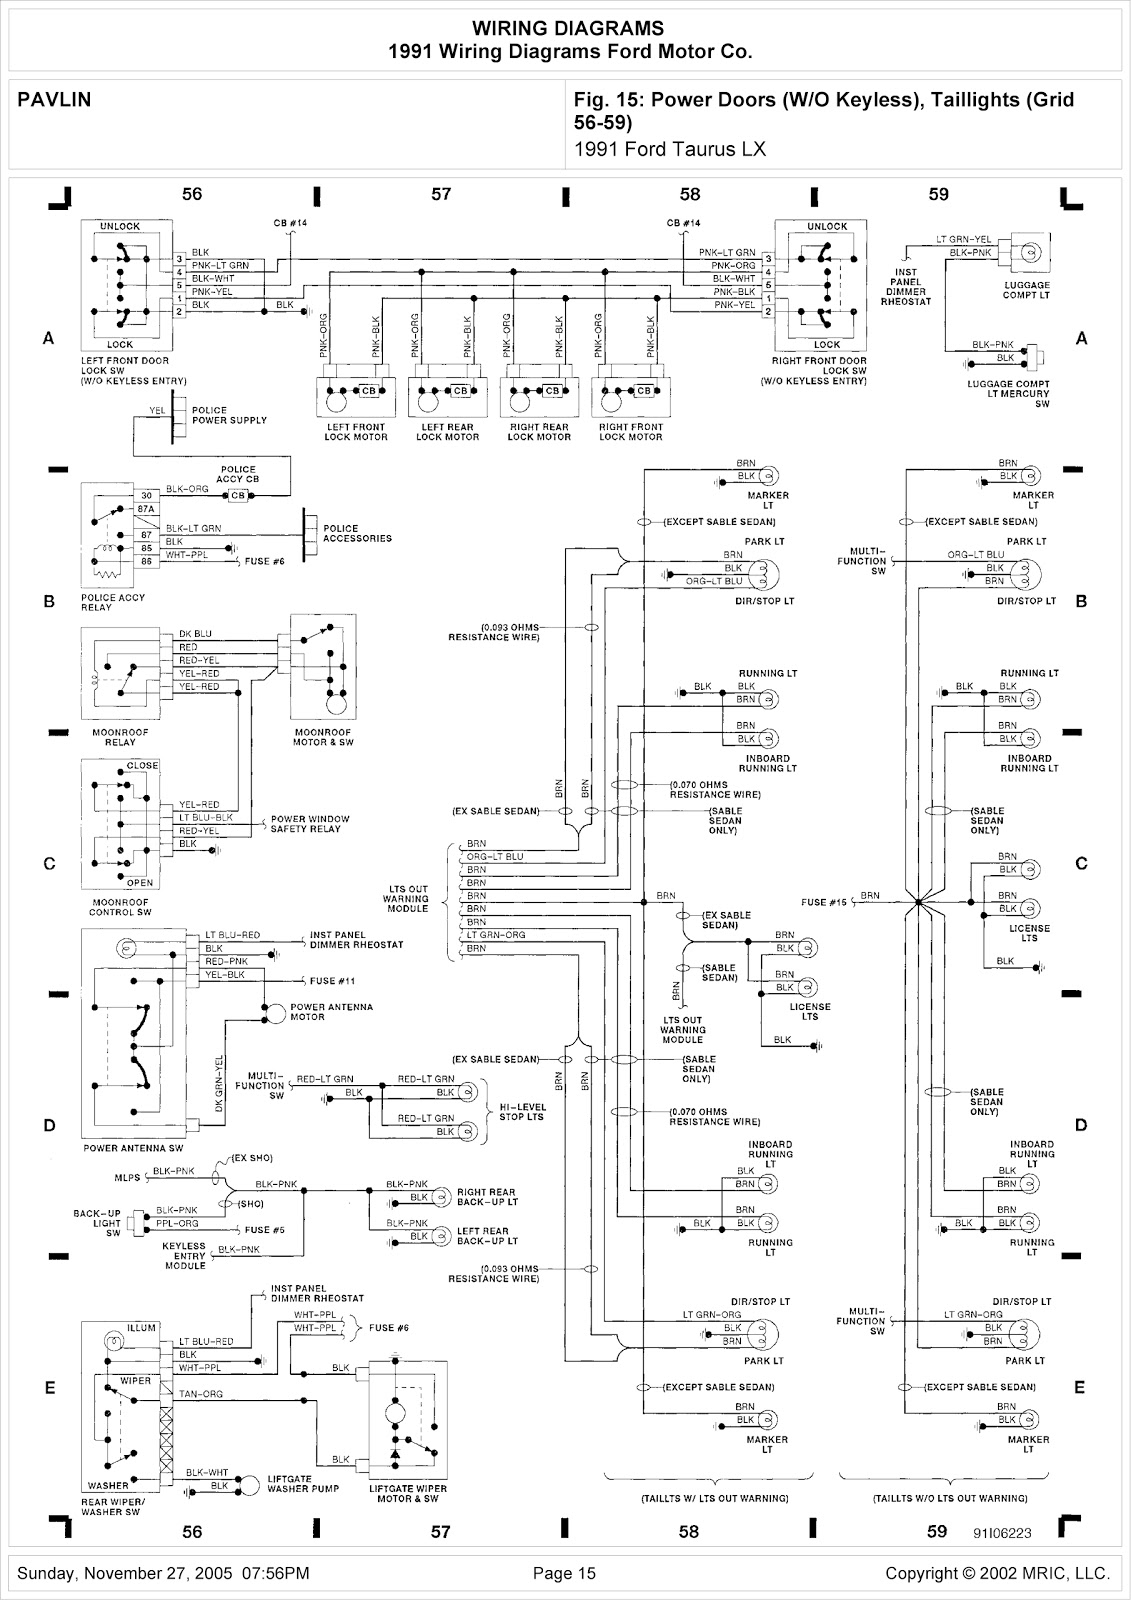 2000 ford taurus fuse box diagram 2000 ford taurus diagram 2000 ford taurus wiring diagram 2000 [ 1131 x 1600 Pixel ]